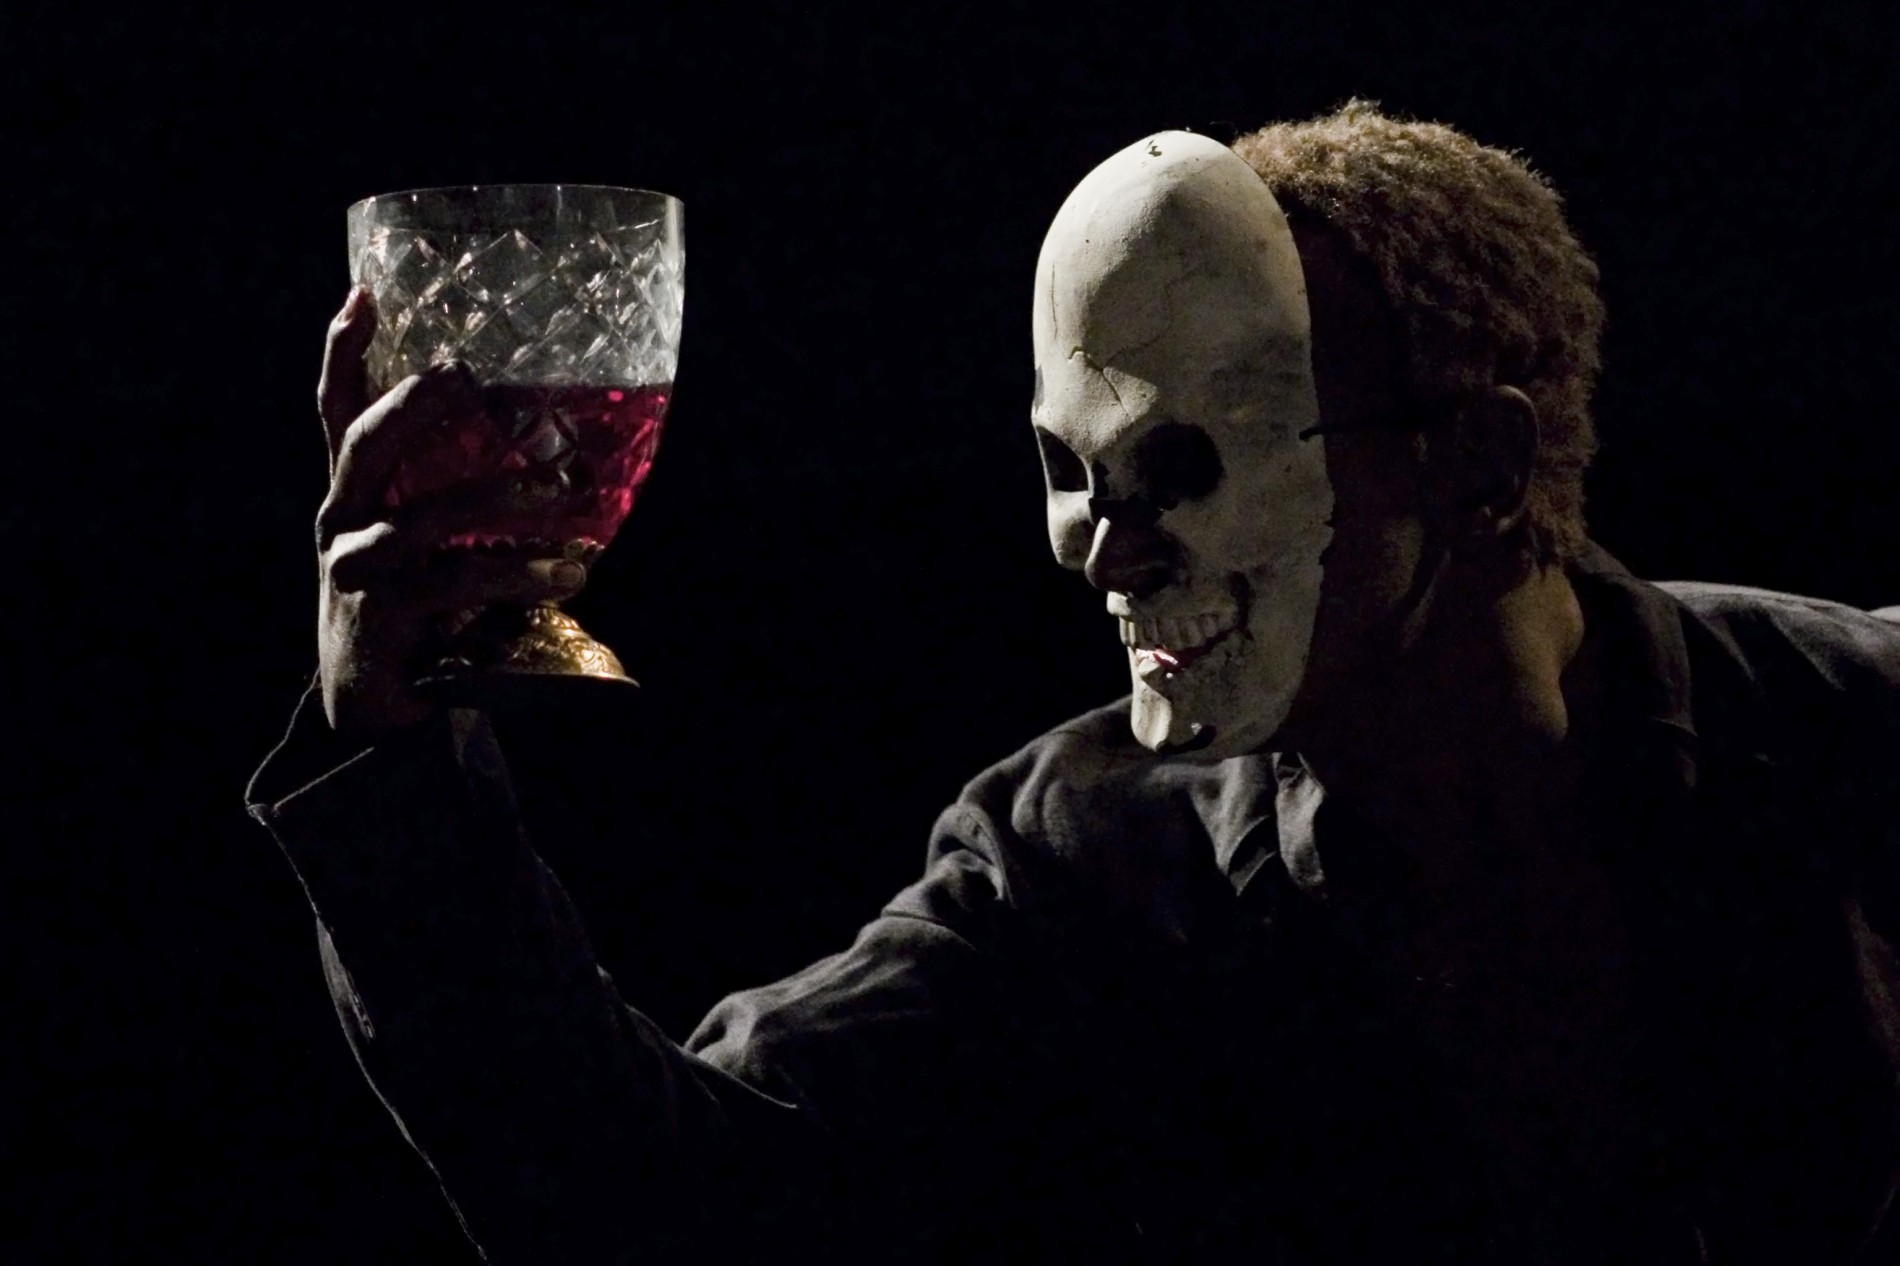 Czarna maska - zdjęcie z planu